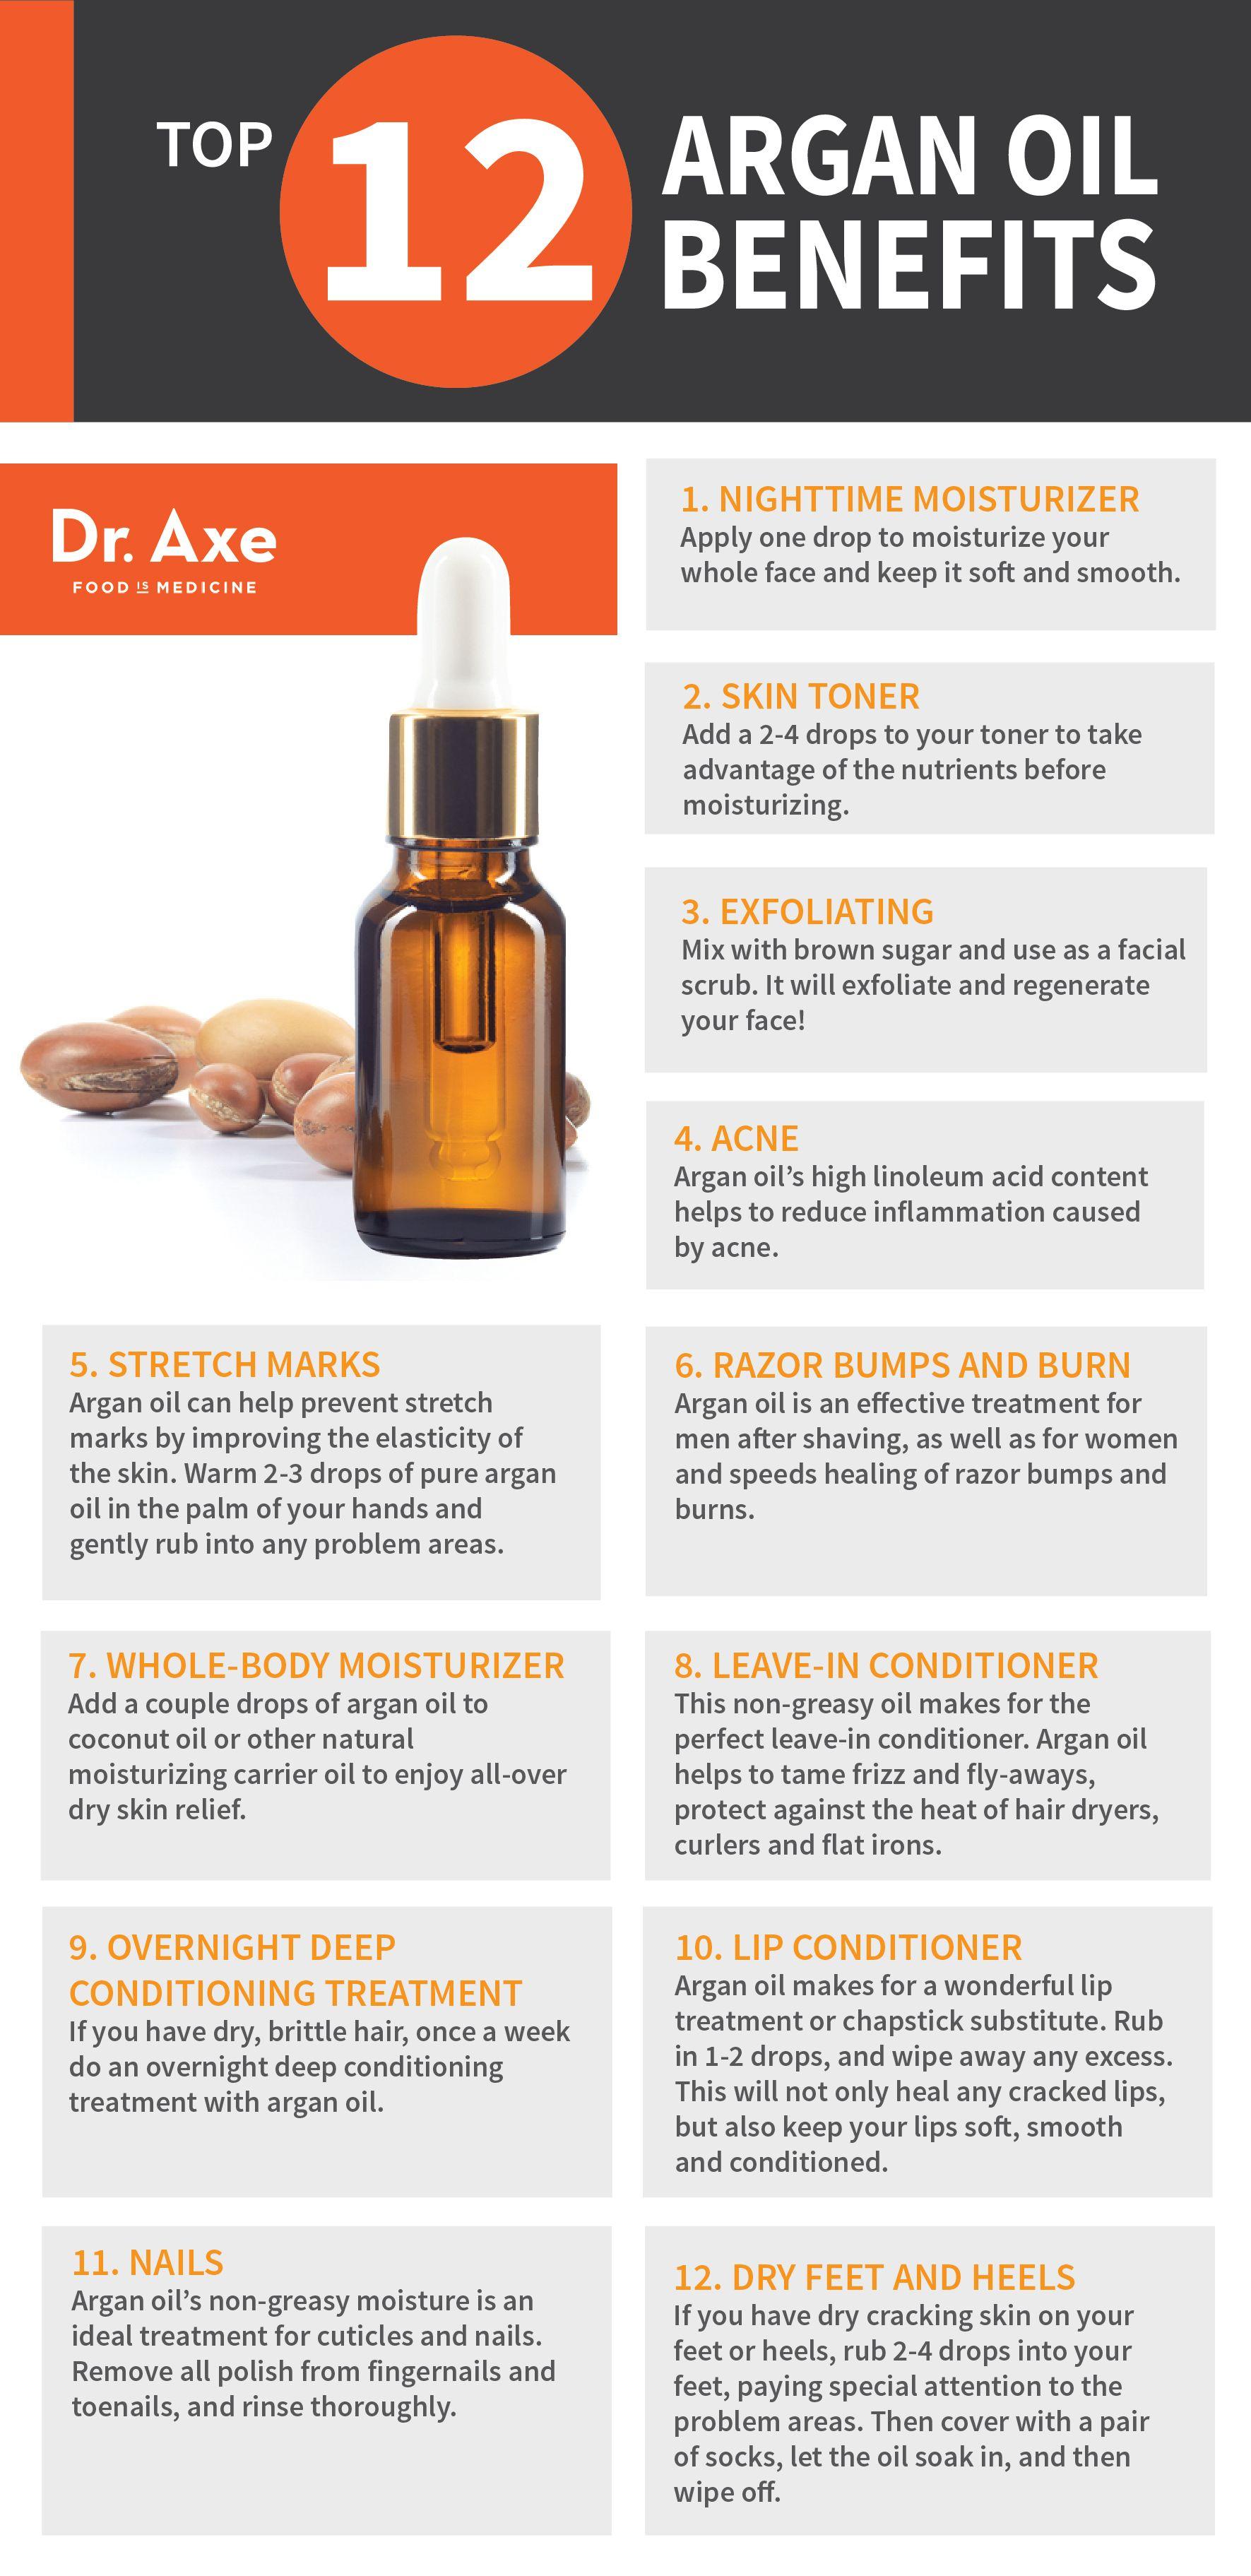 Argan Oil Benefits Top 12 Uses For Healthy Skin And Hair Argan